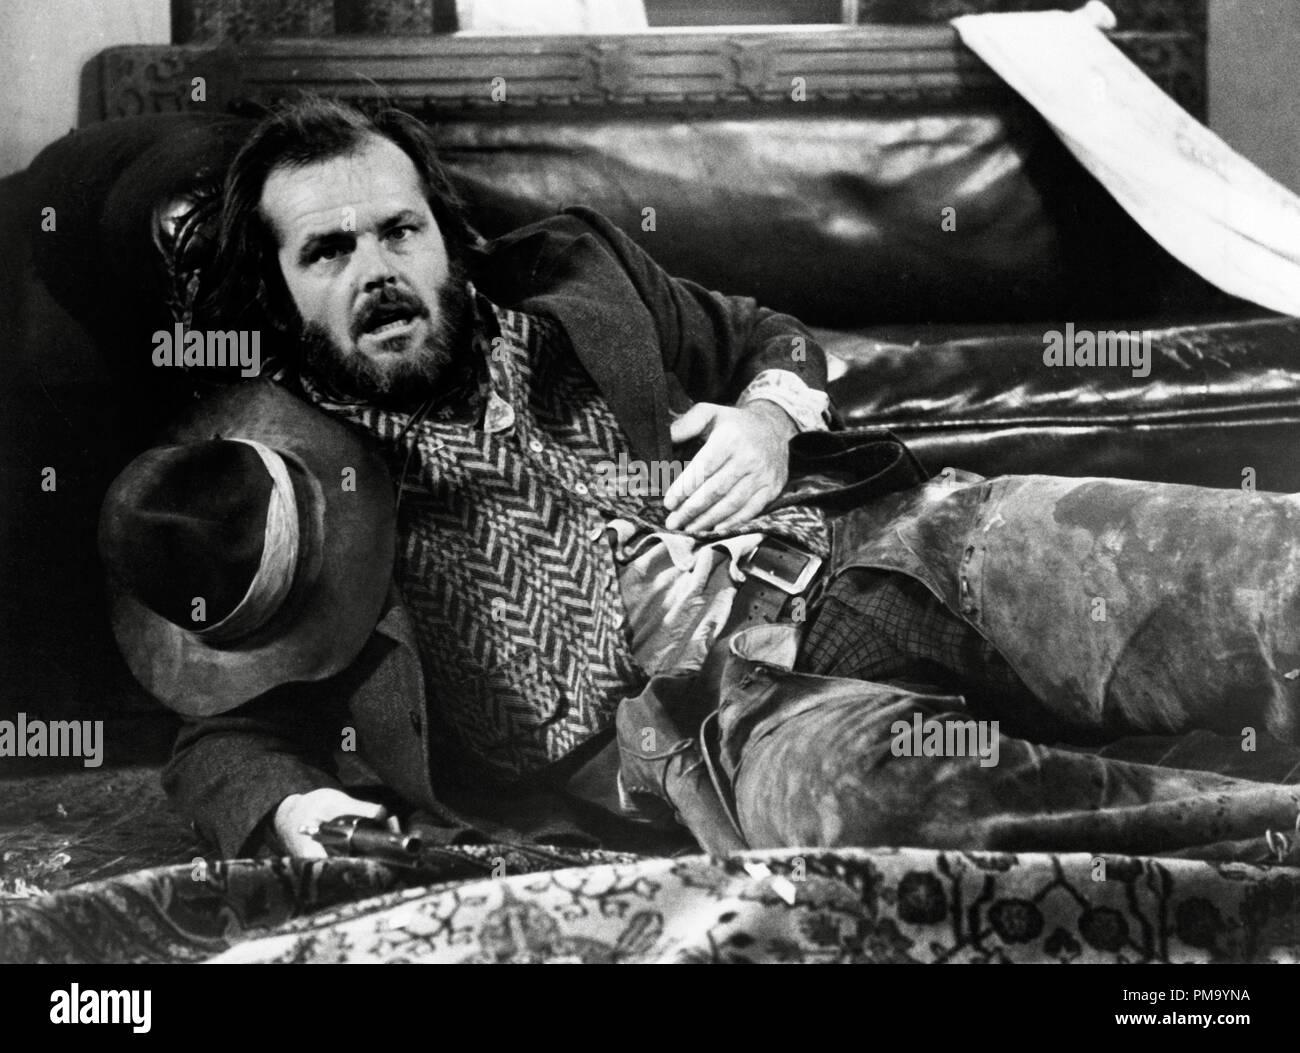 Studio Publicity Still: 'The Missouri Breaks' Jack Nicholson 1976 UA    File Reference # 31780_256THA - Stock Image